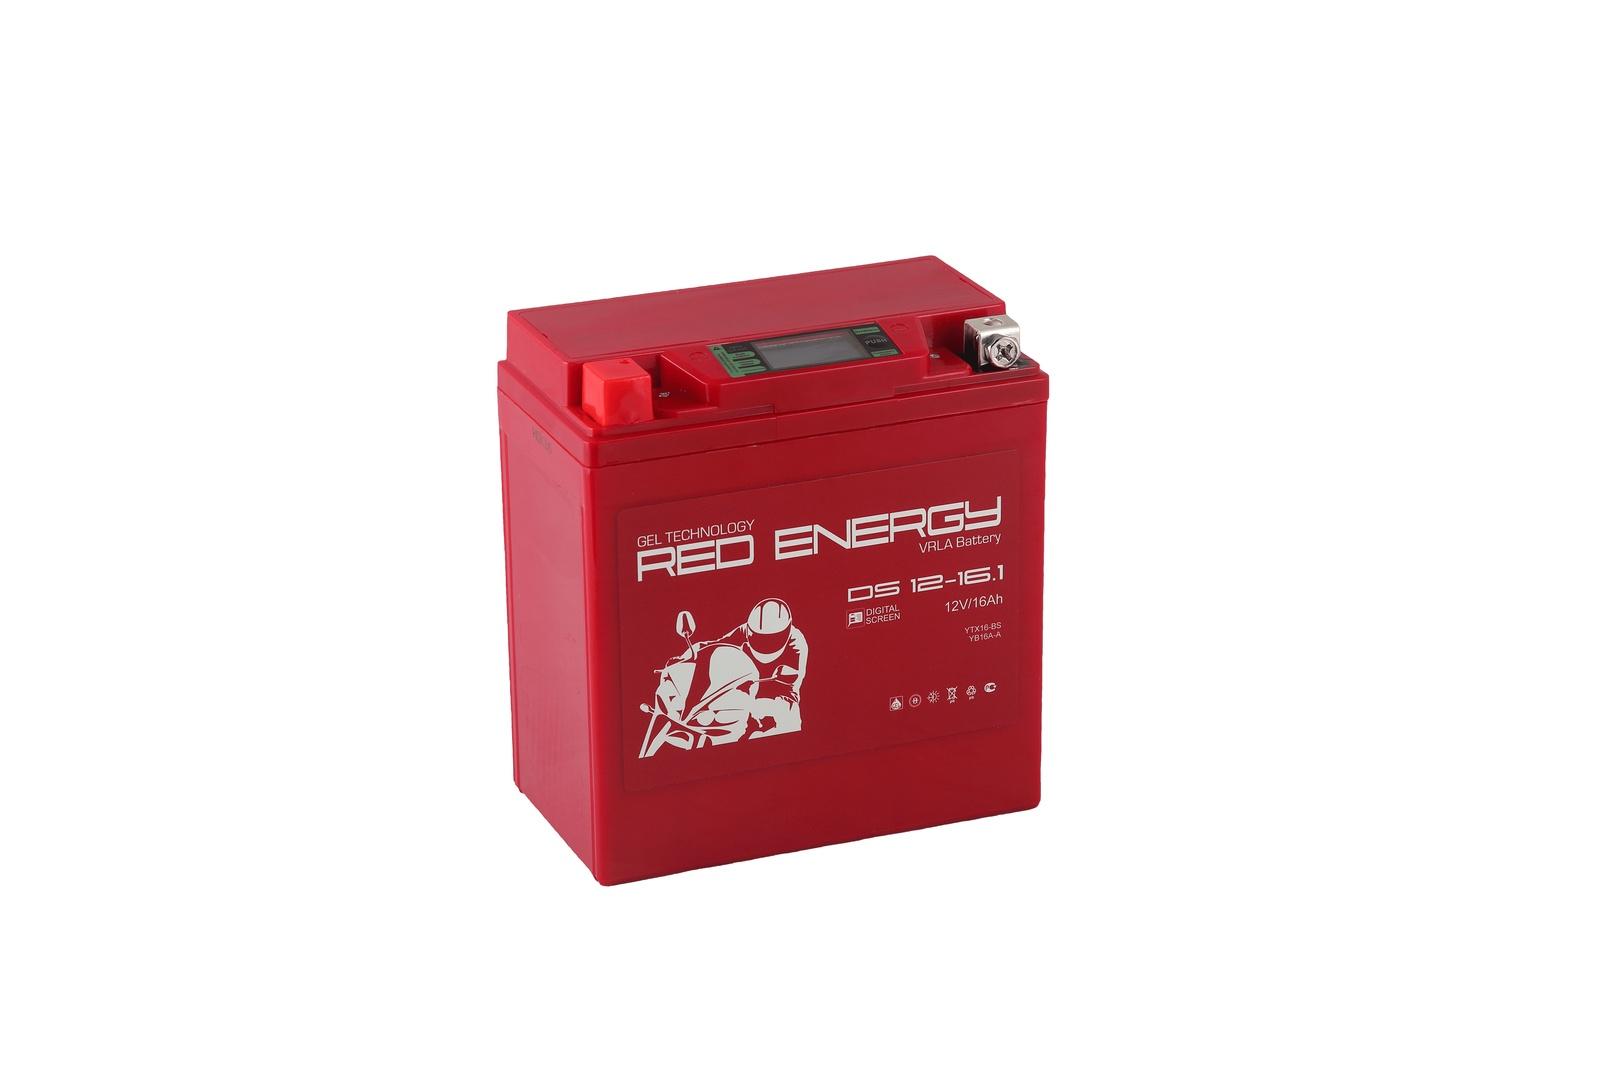 Аккумулятор для мототехники Red Energy DS 1216.1 все цены